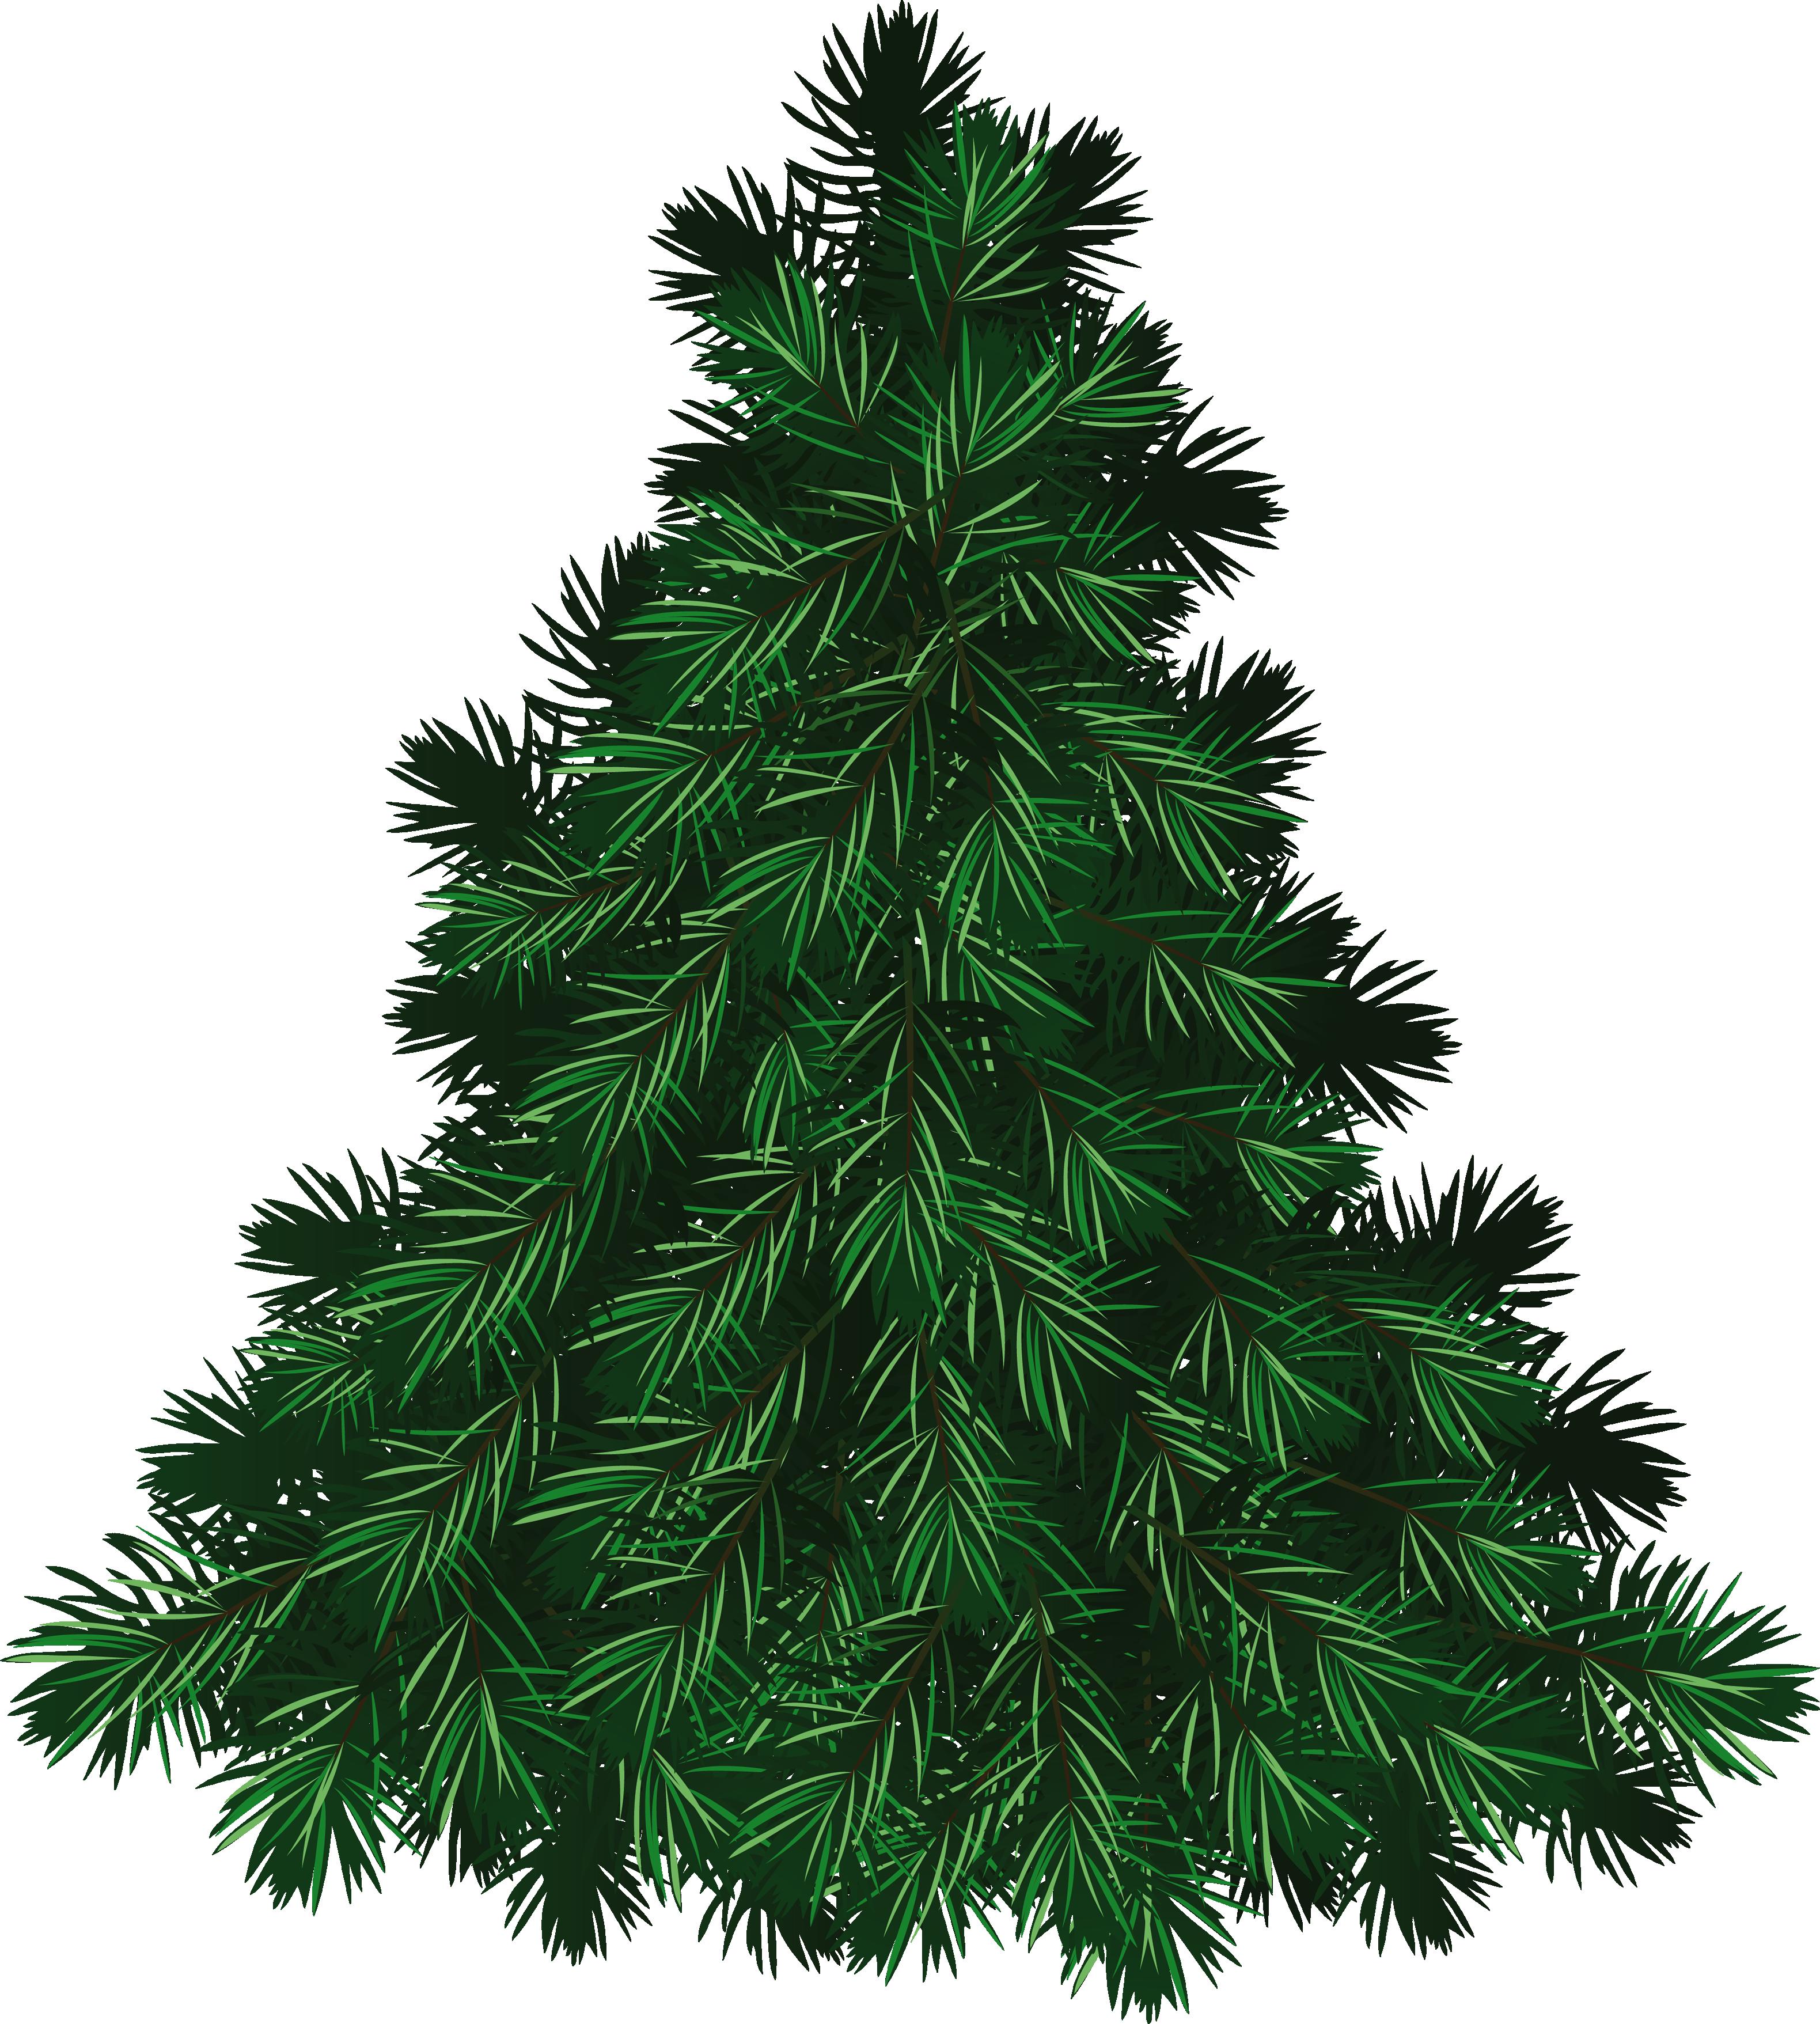 Fir Tree PNG Image